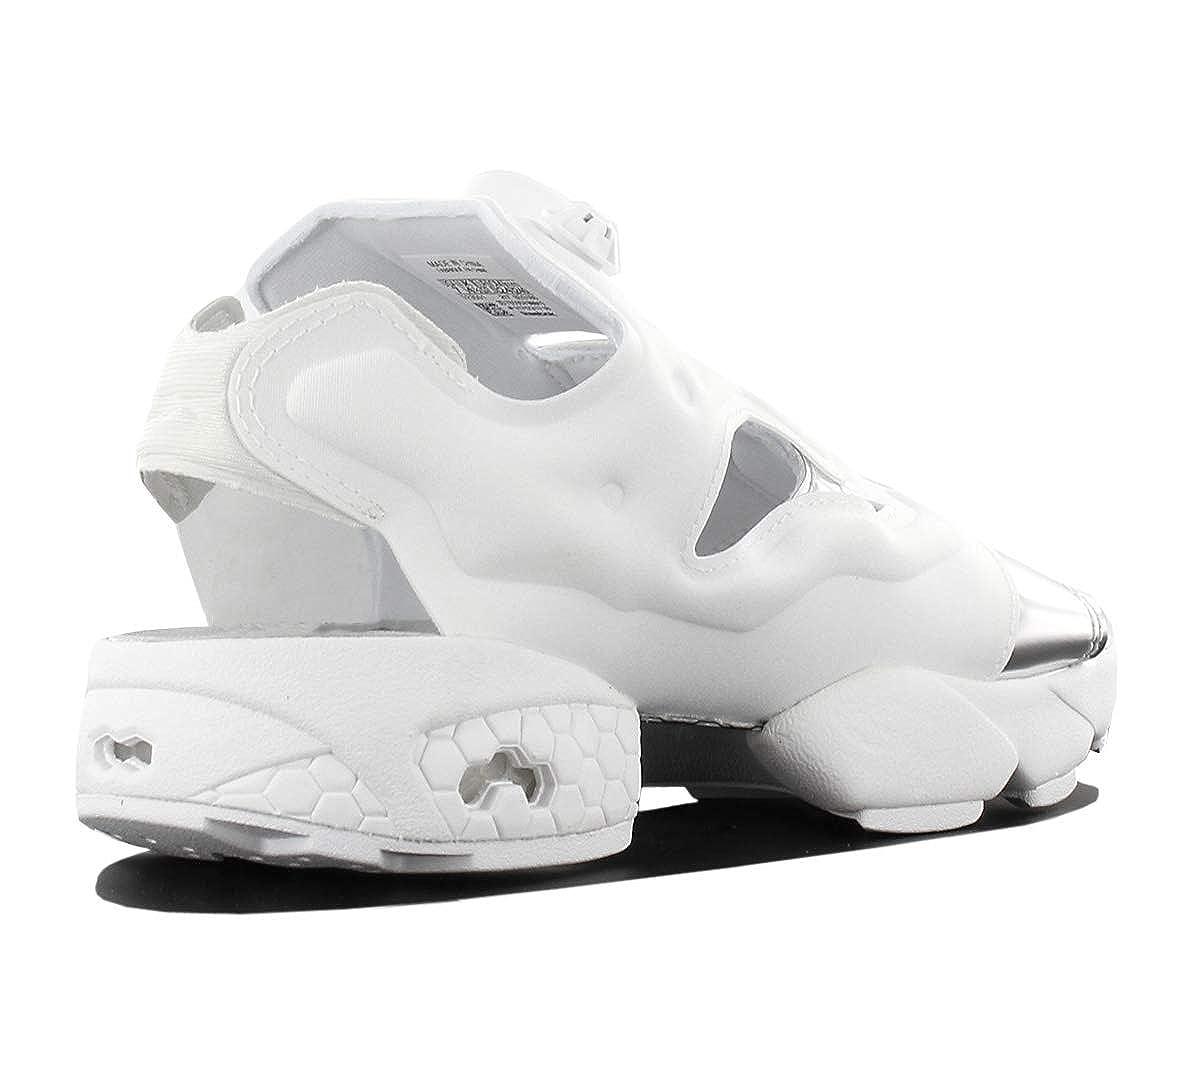 Reebok Reebok Reebok Classic Instapump Fury Sandal Mag Schuhe Damen Sandale Outdoor-Sandale Weiß mit Fersenriemen 3bba5a